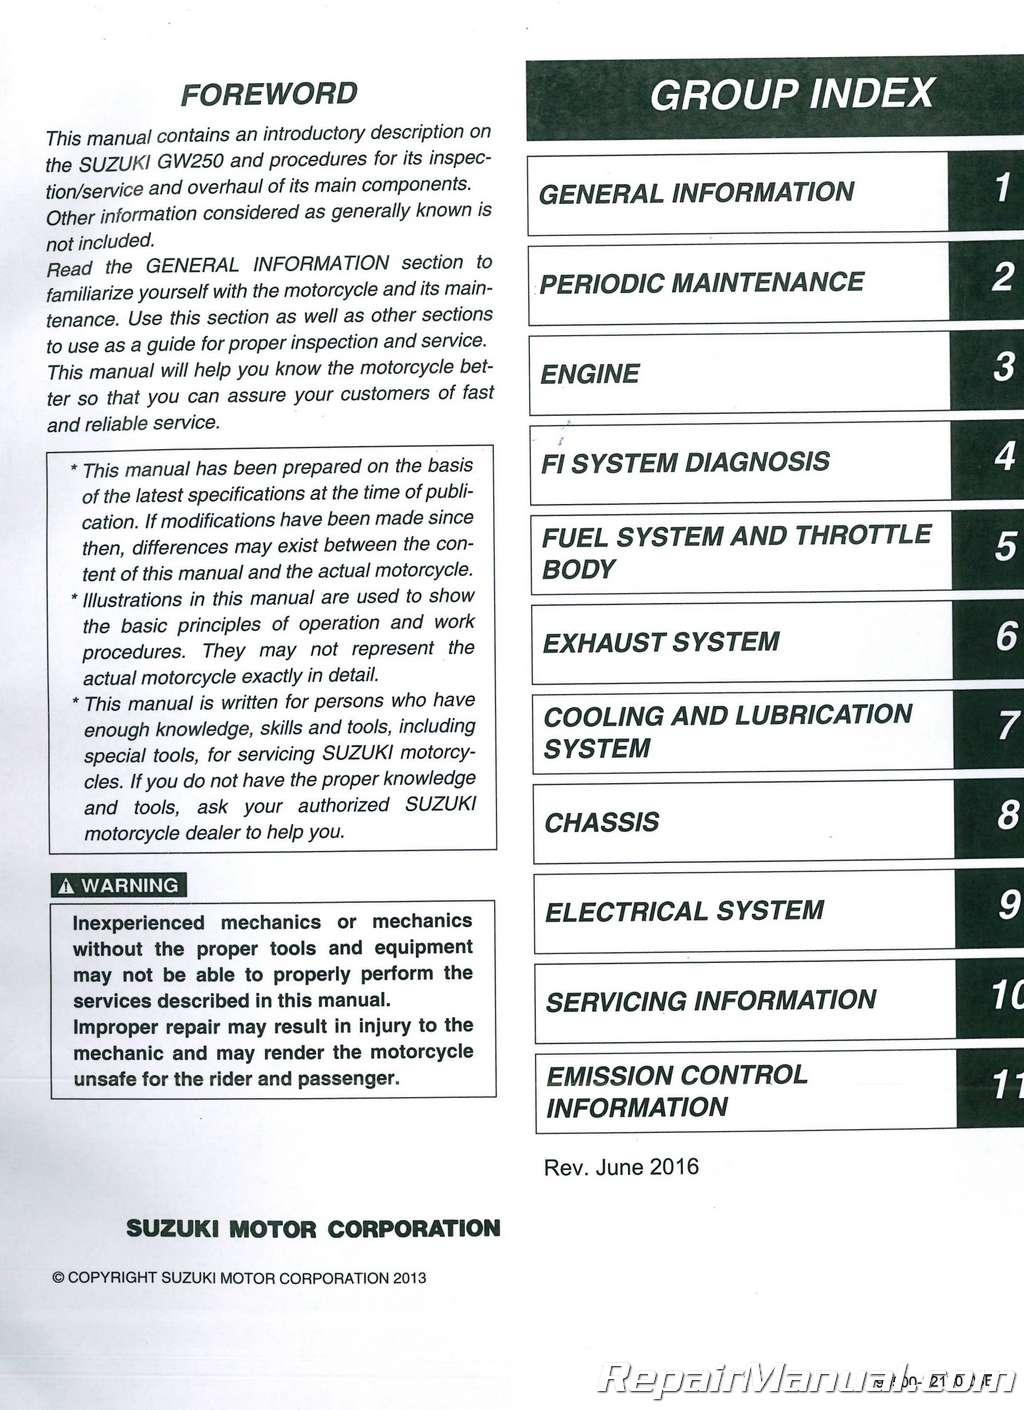 ... 2013-2017-Suzuki-GW250-Motorcycle-Service-Manual_002.jpg ...